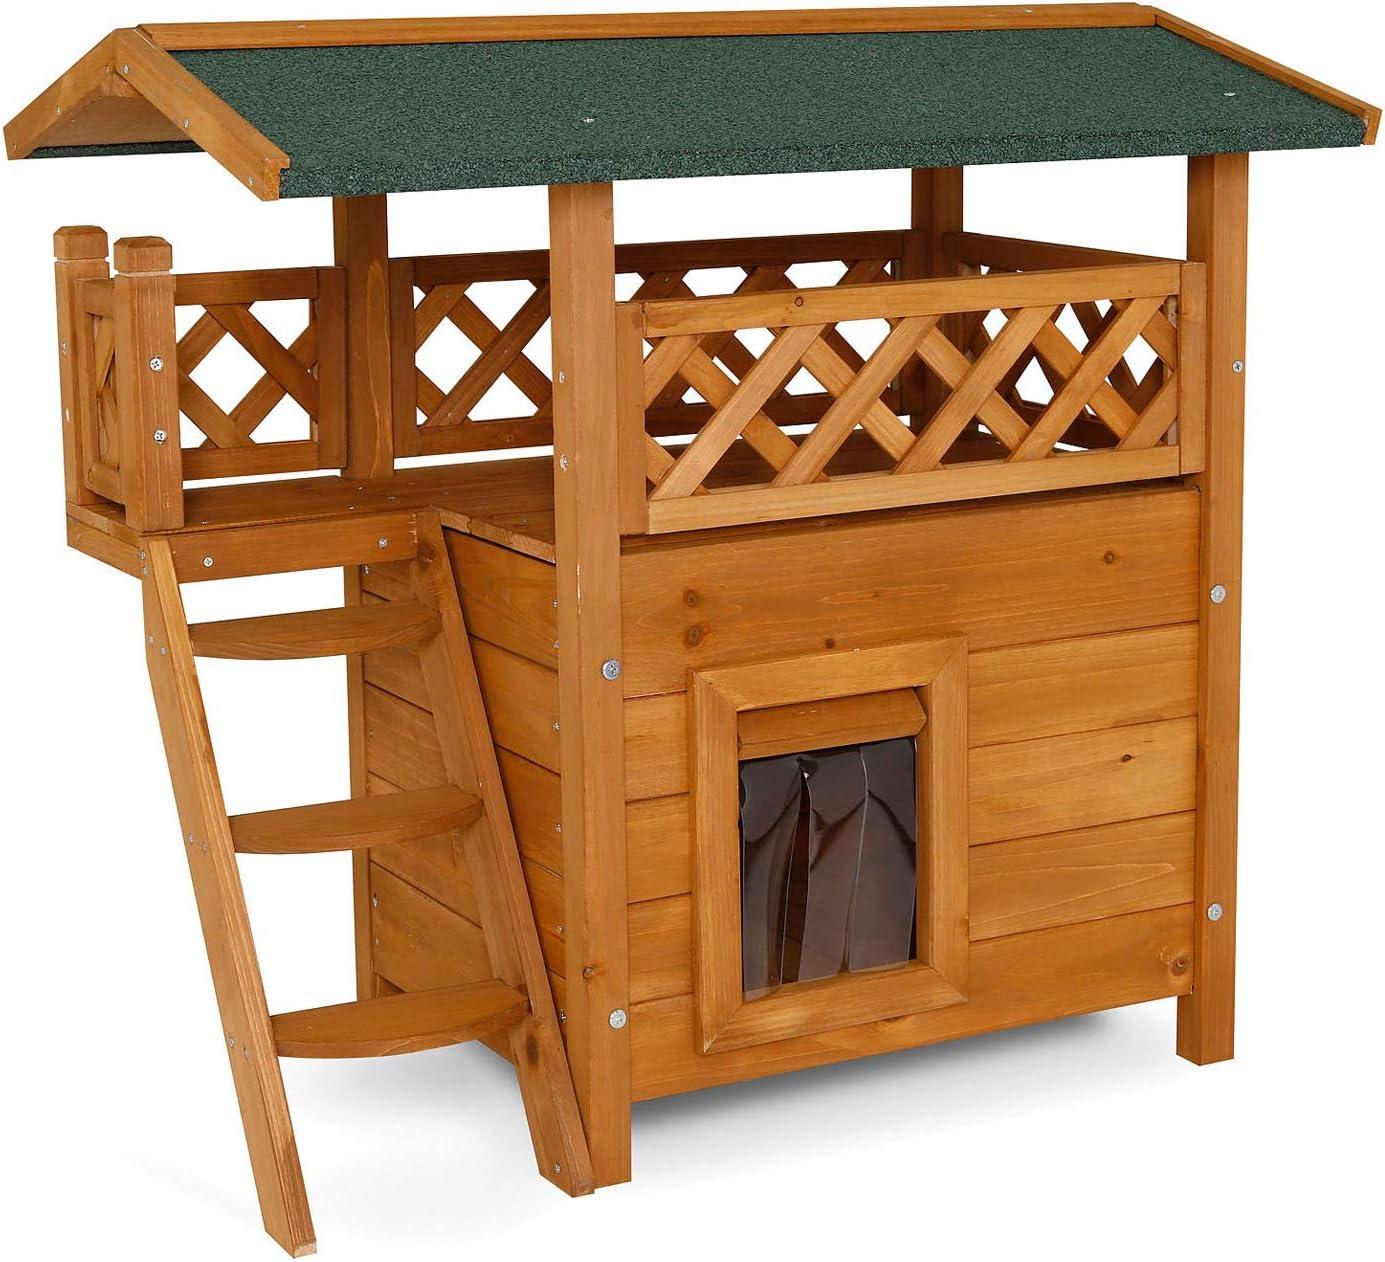 Dibea - Caseta para Gato (Madera, 77 x 50 x 73 cm), con terraza y Escalera